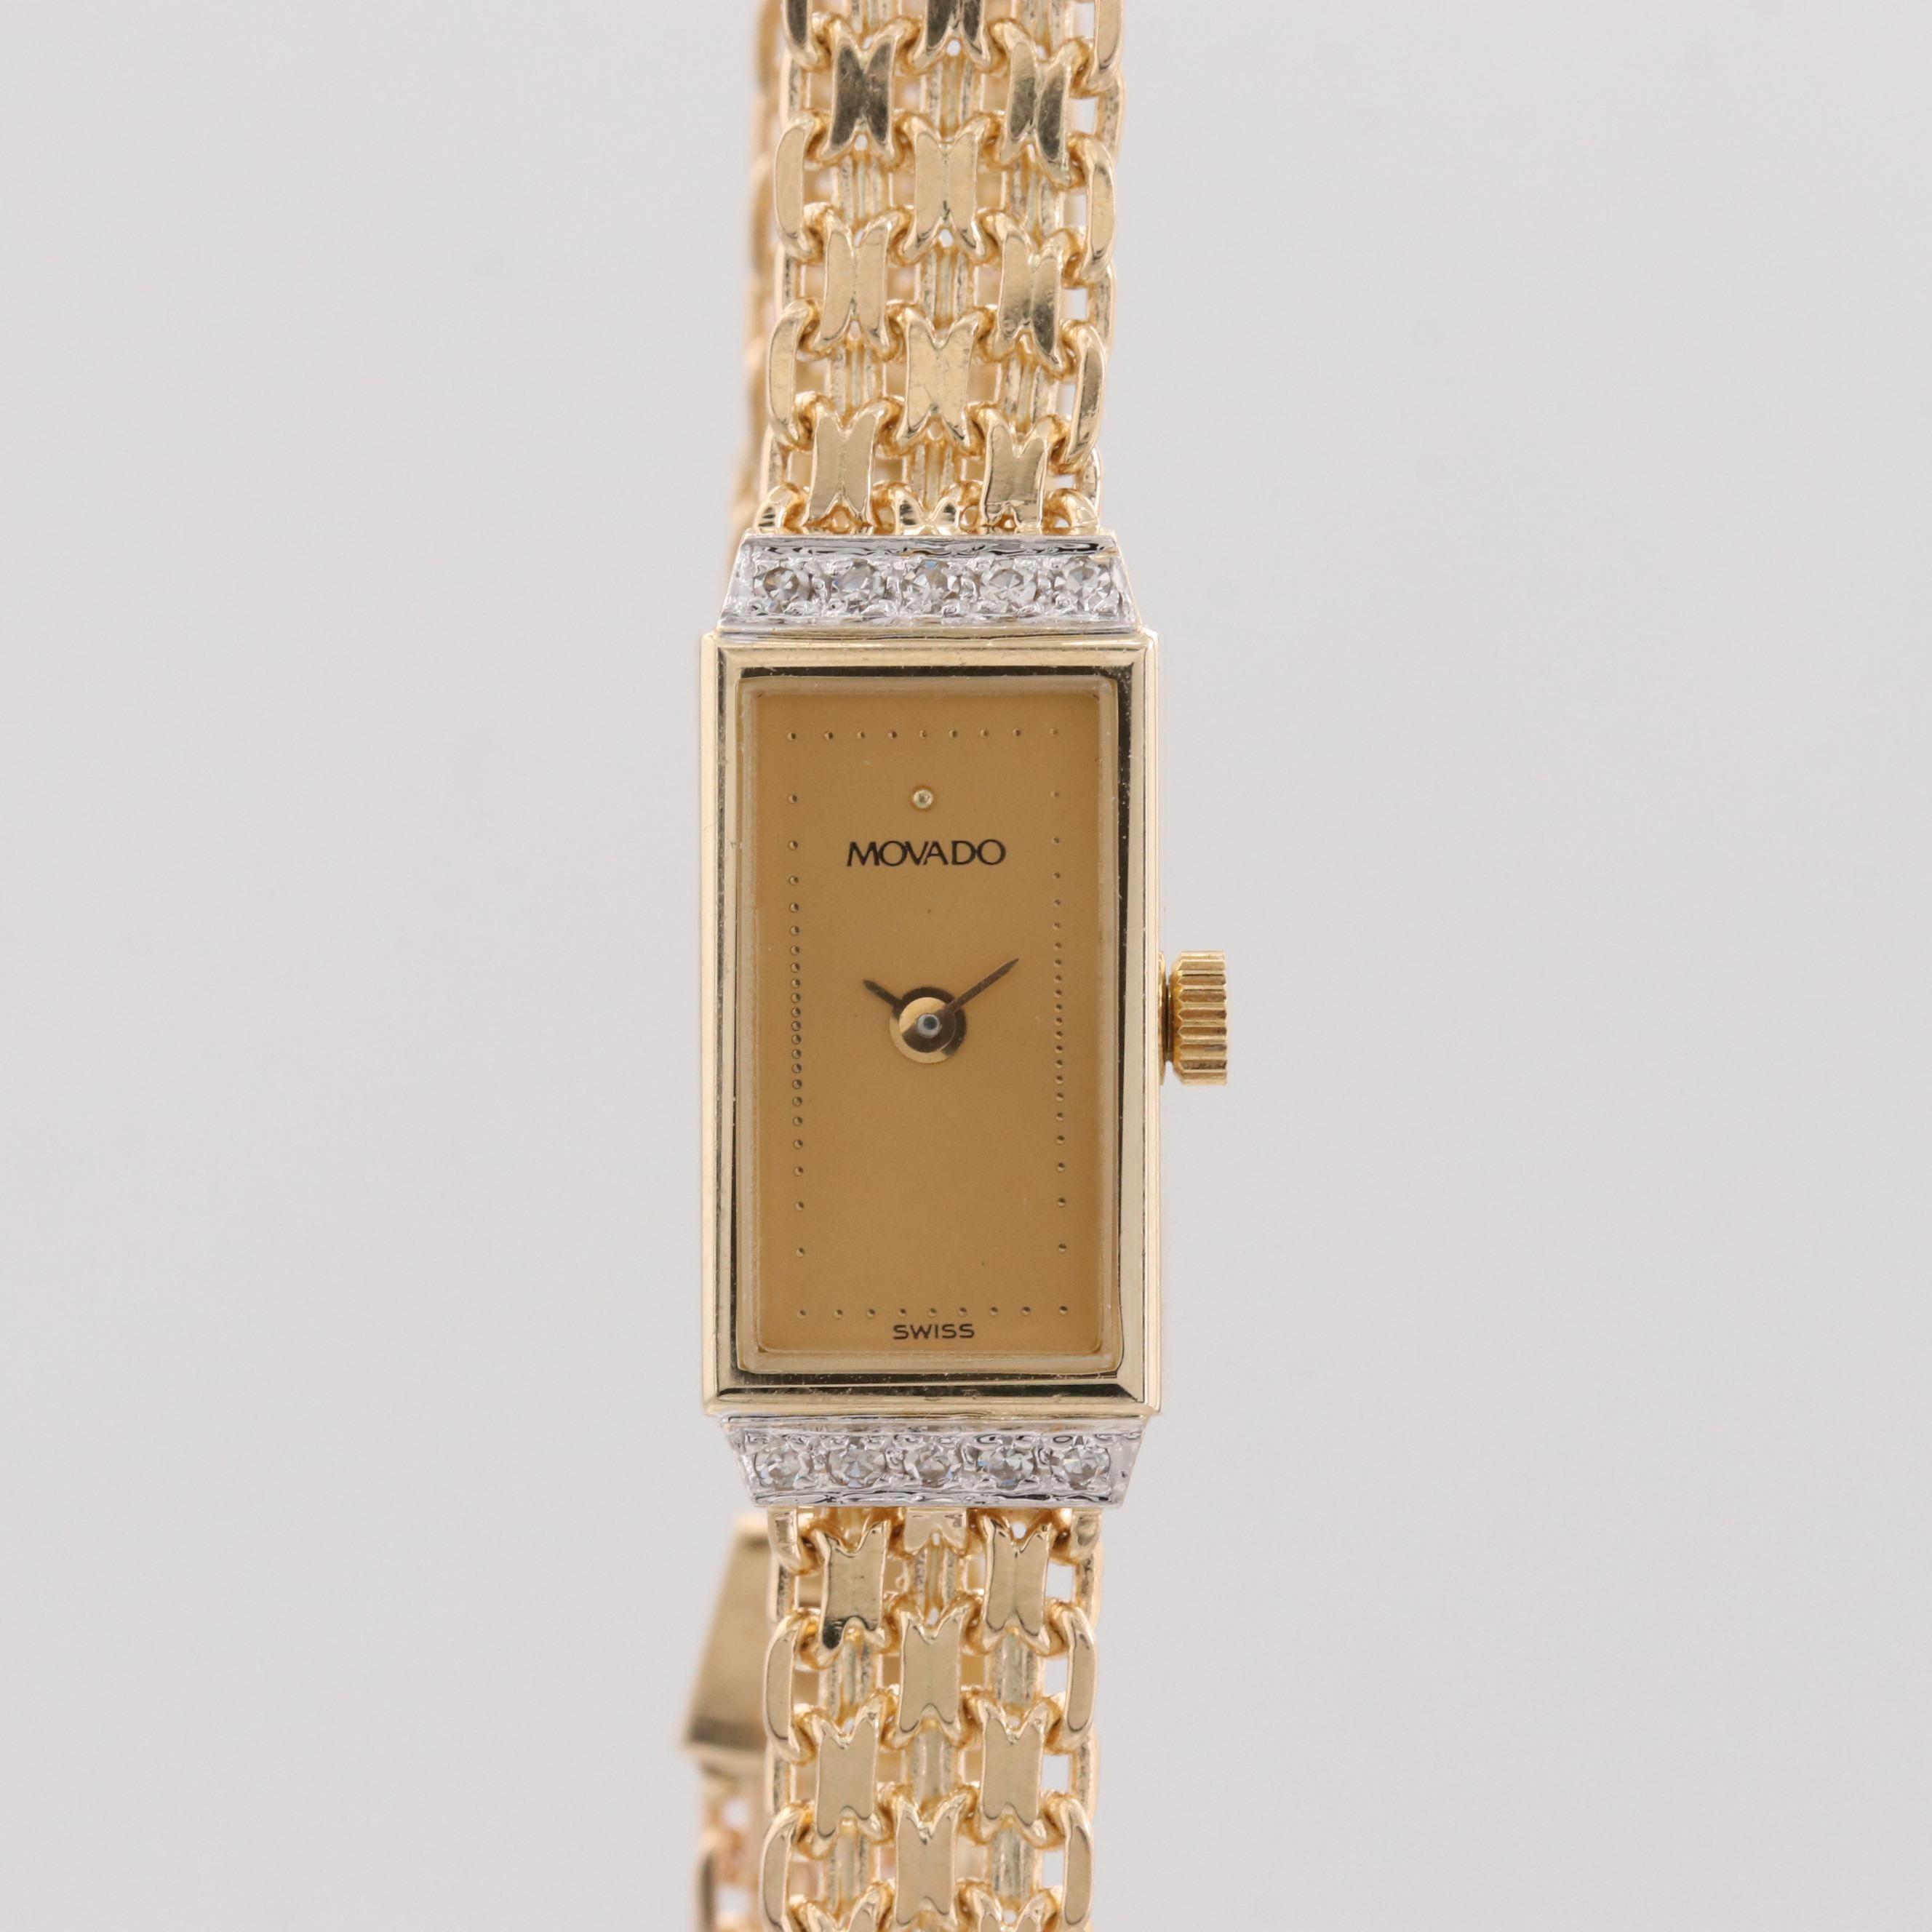 Movado 14K Yellow Gold Wristwatch With a Diamond Bezel